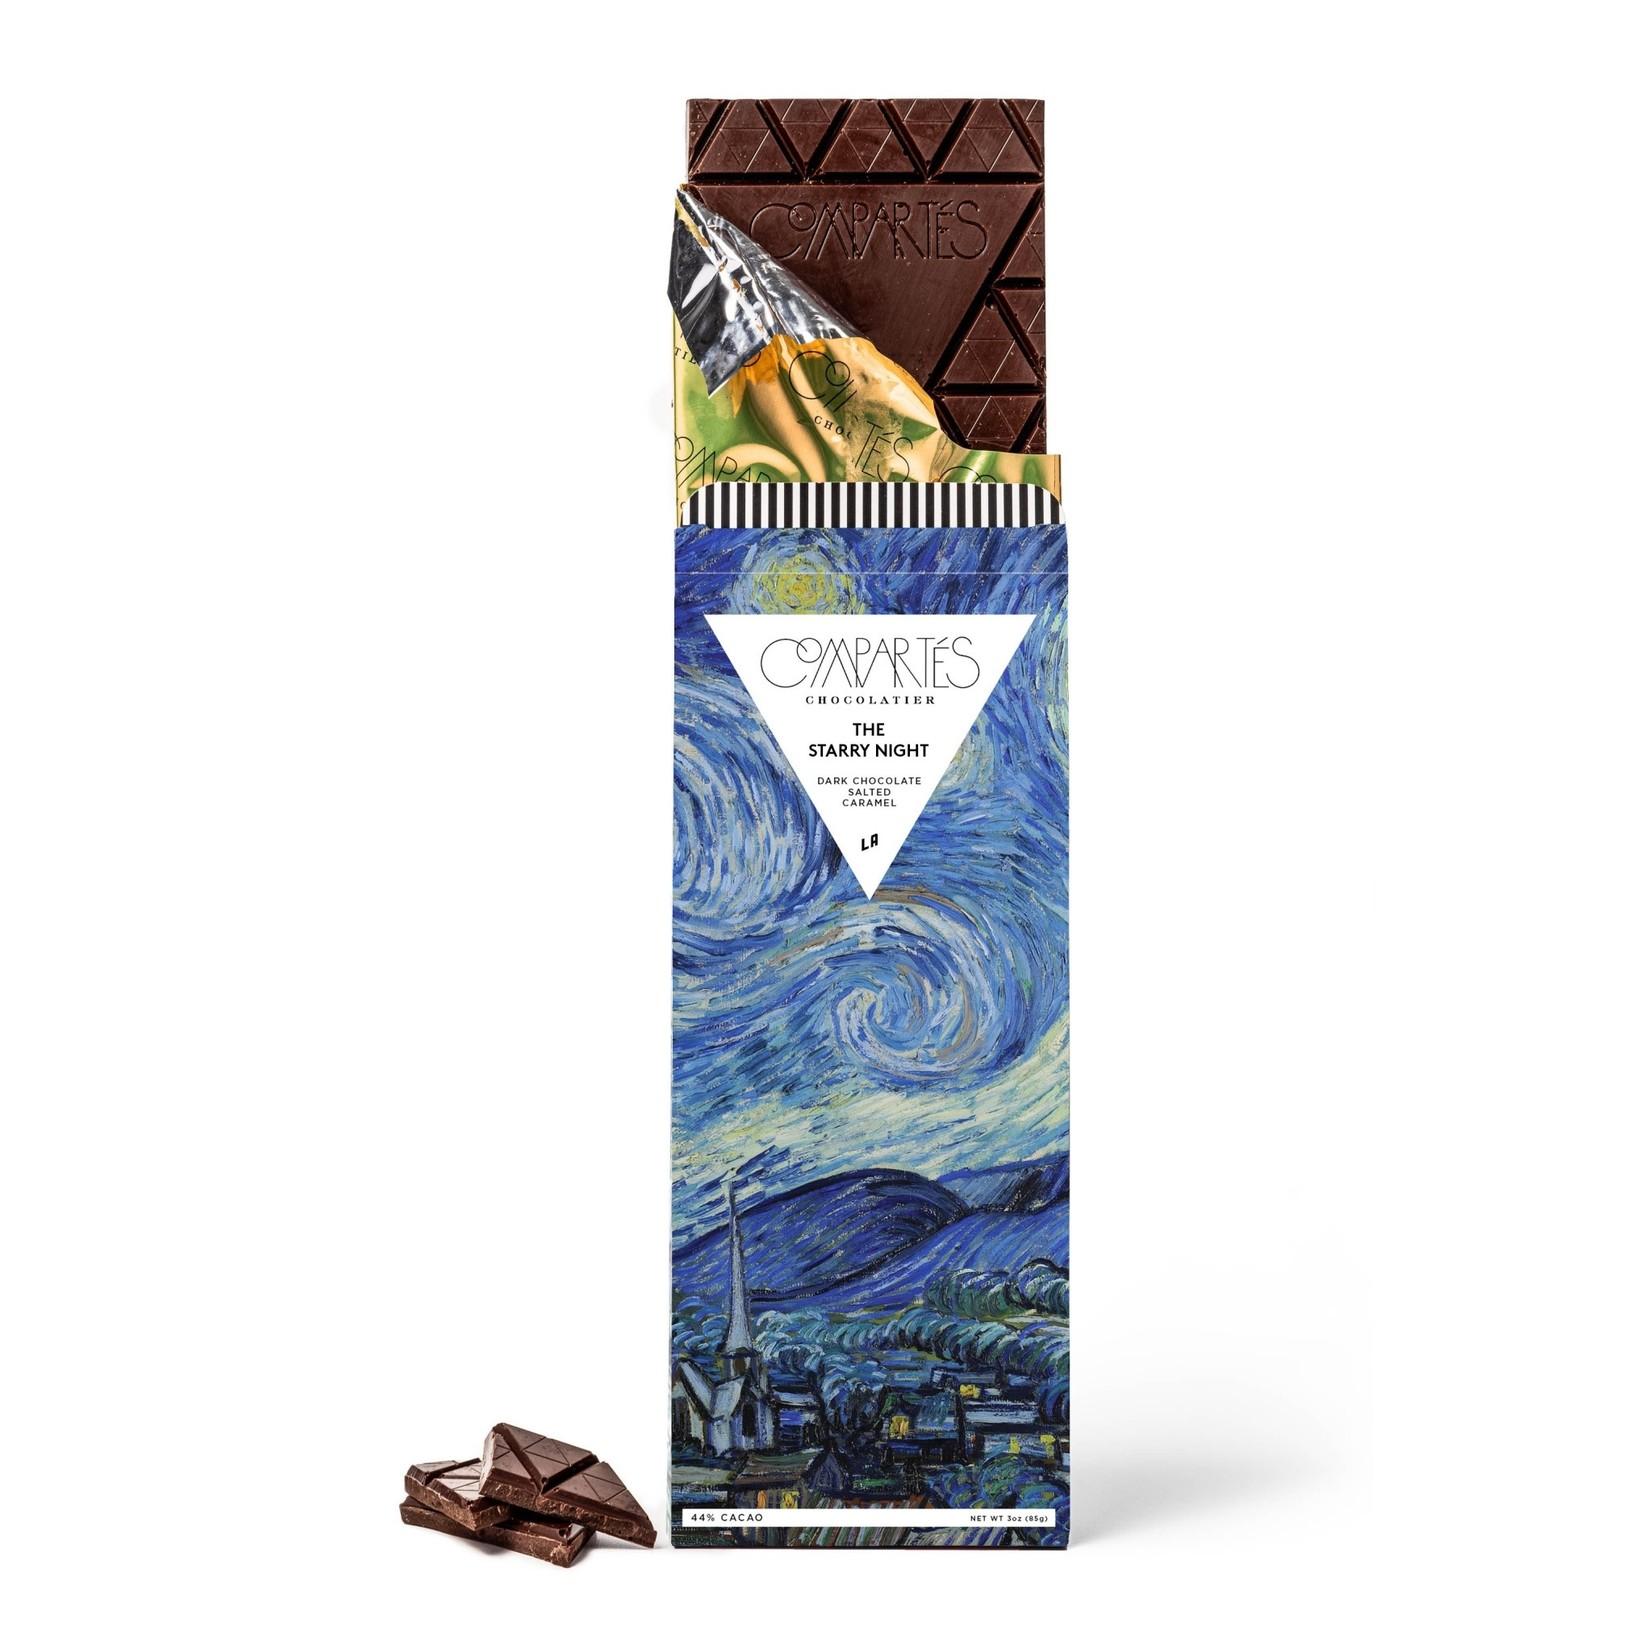 Compartes Chocolate Compartes Starry Night Van Gogh Chocolate Bar -Salted Caramel Dark